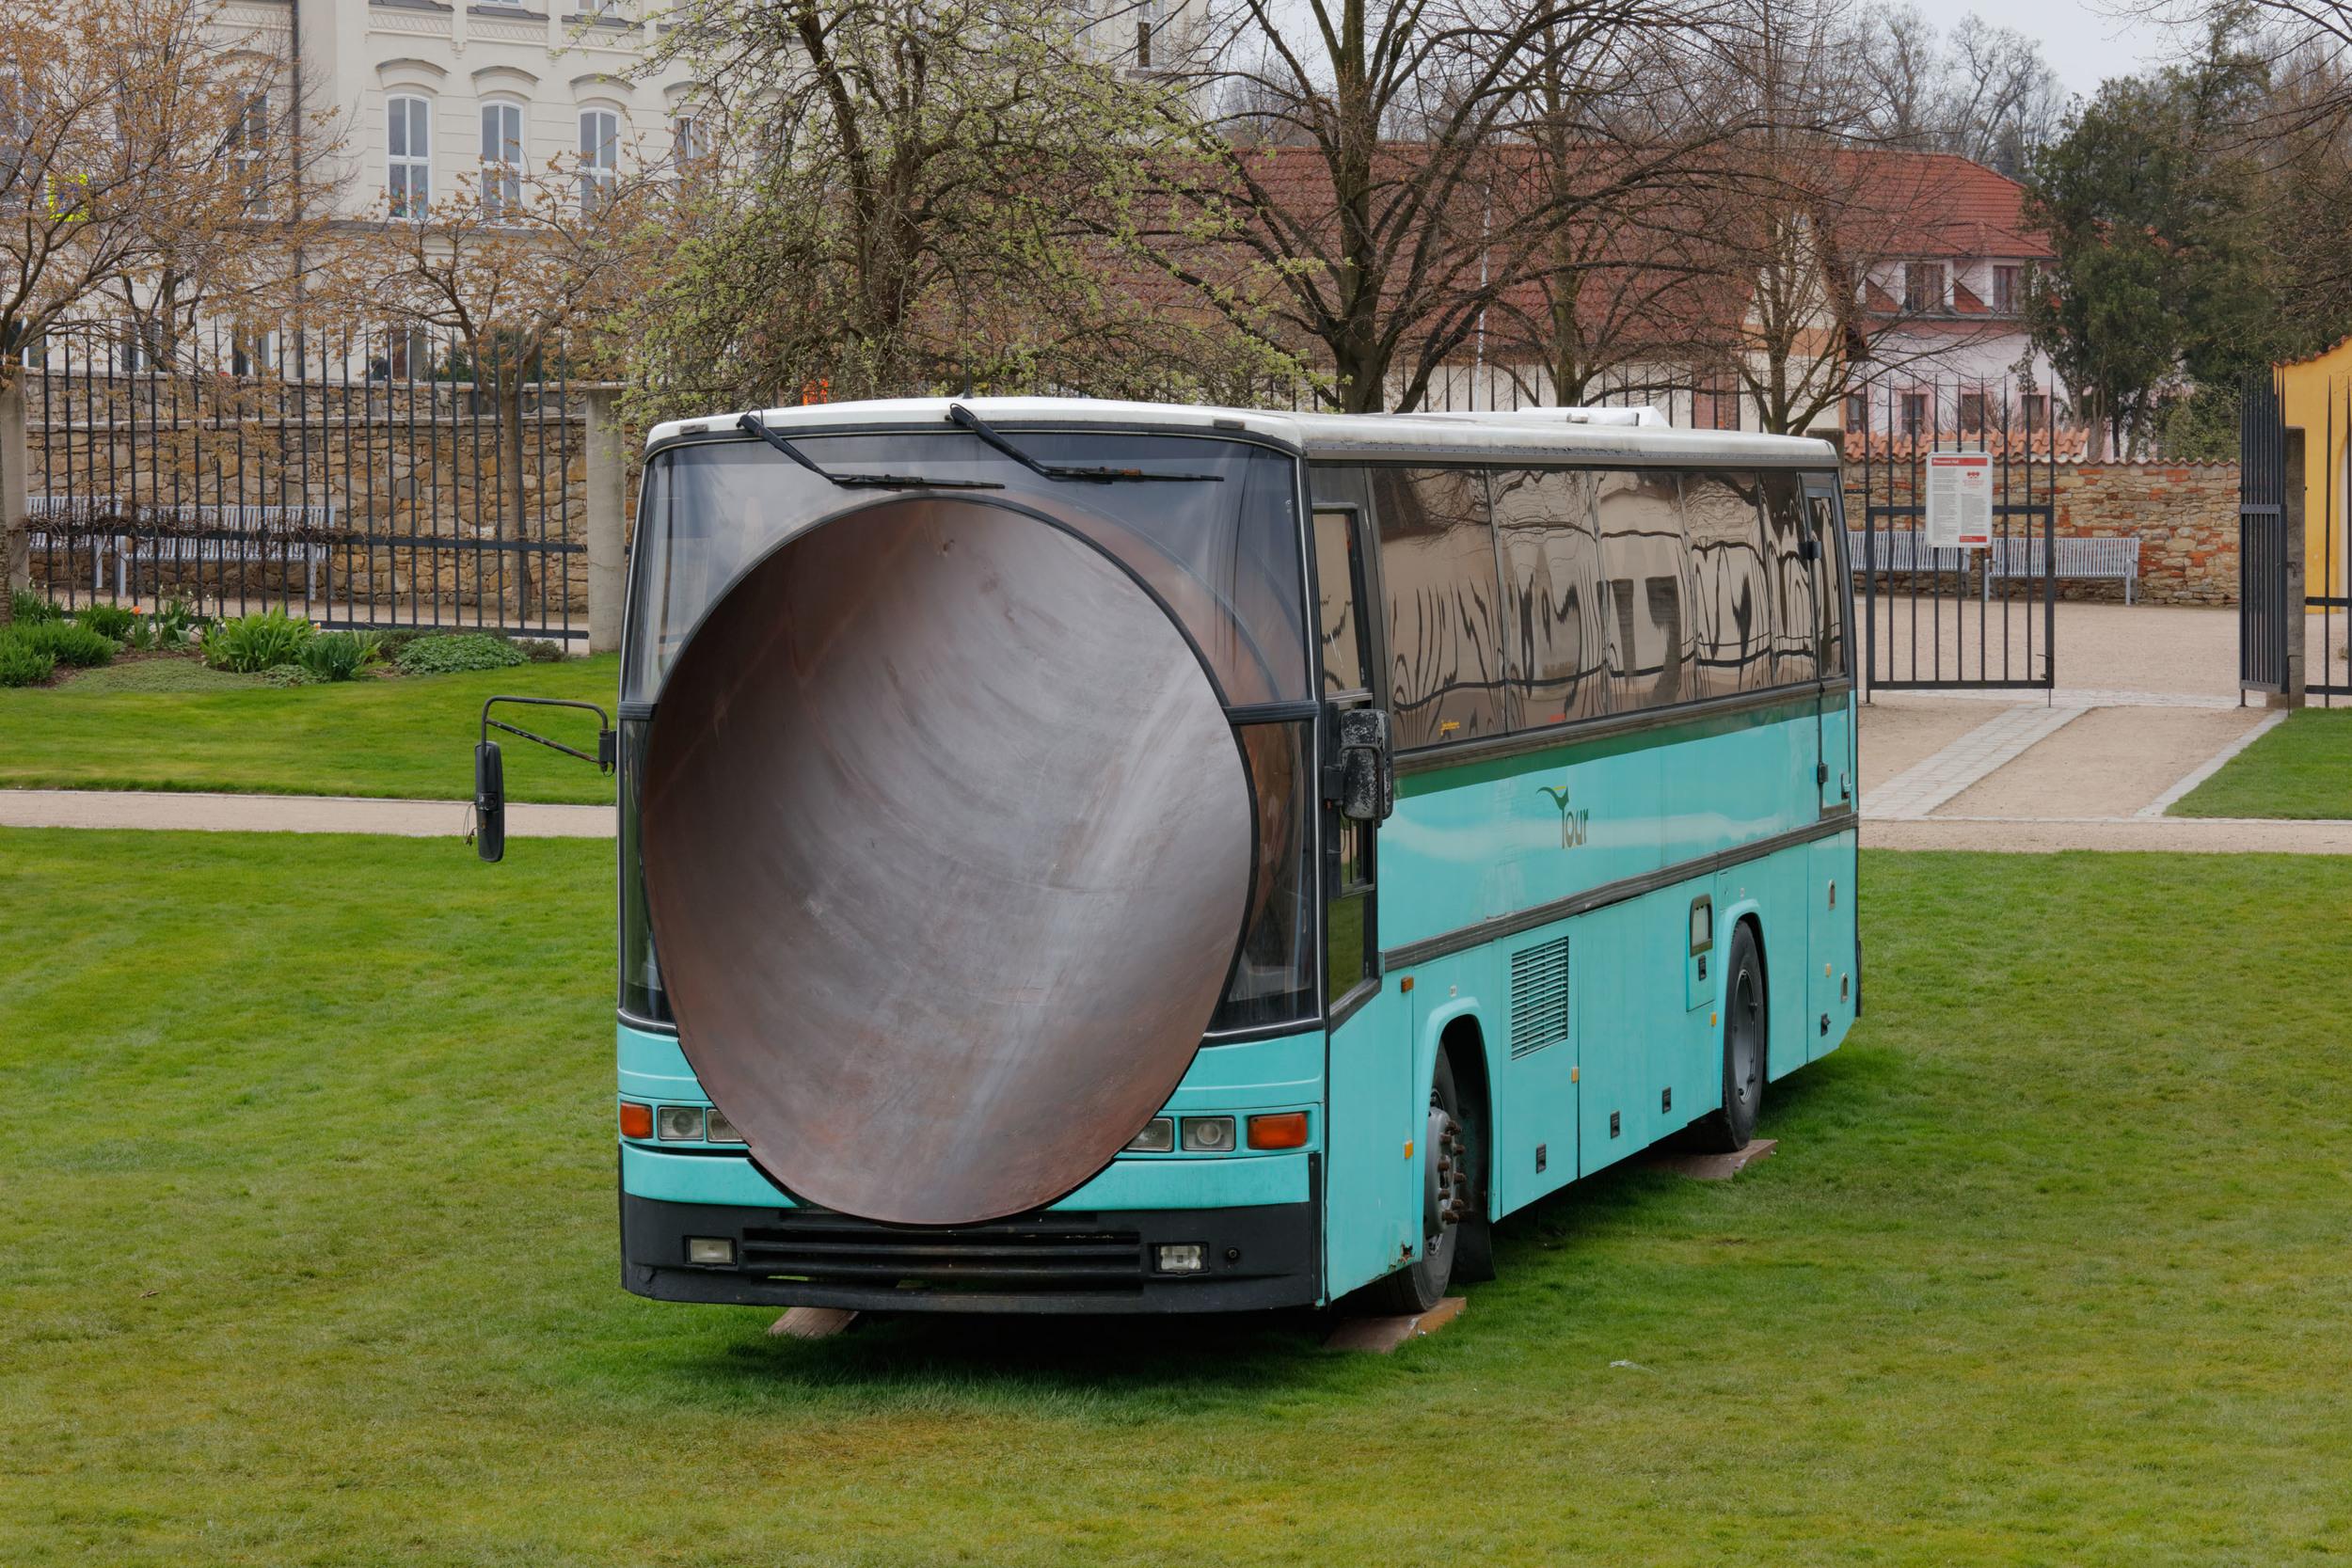 Lukáš Rittstein, Tour 2010, 2010, ocelový tubus, autobus VOLVO, 2,5 x 12 x 3,5 m